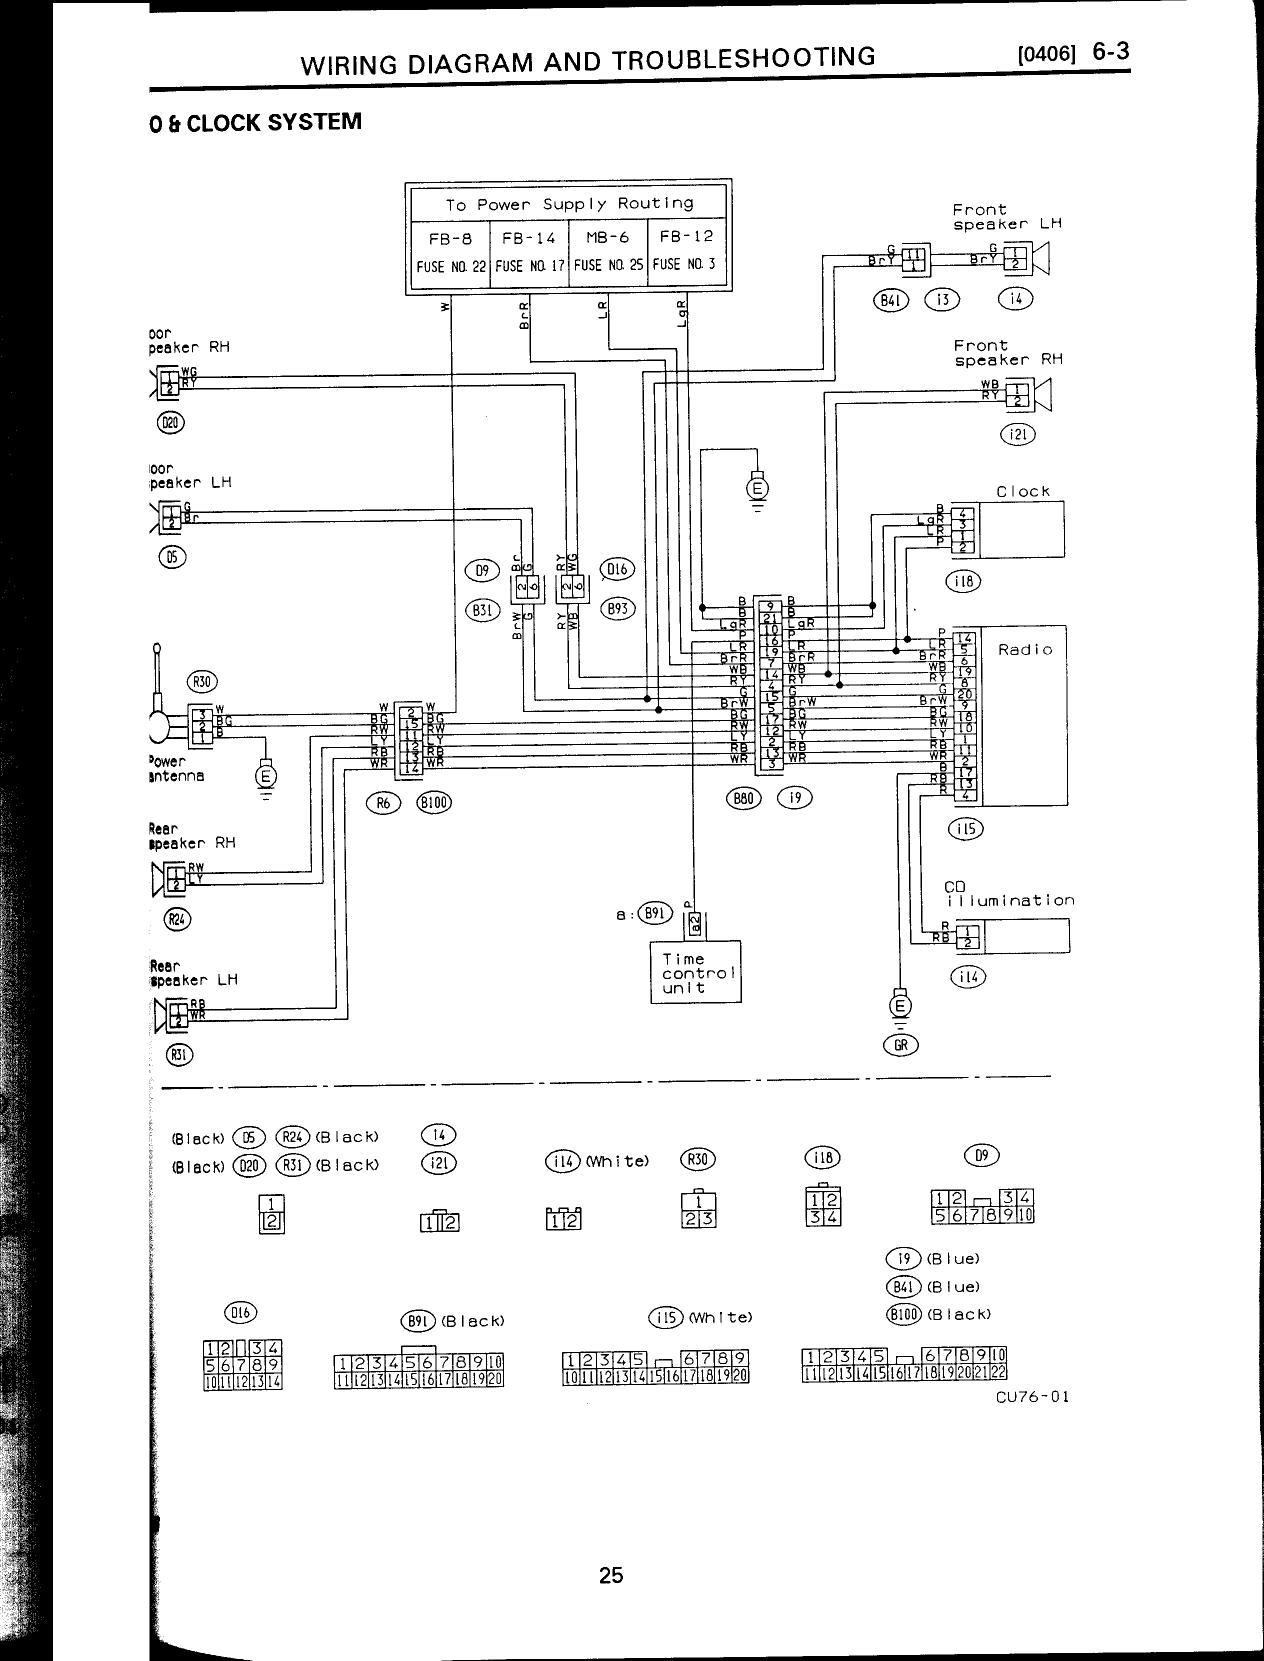 [DIAGRAM_0HG]  2013 subaru legacy radio wiring diagram | 1992 Subaru Legacy Heater Wiring Schematic |  | That's Me!